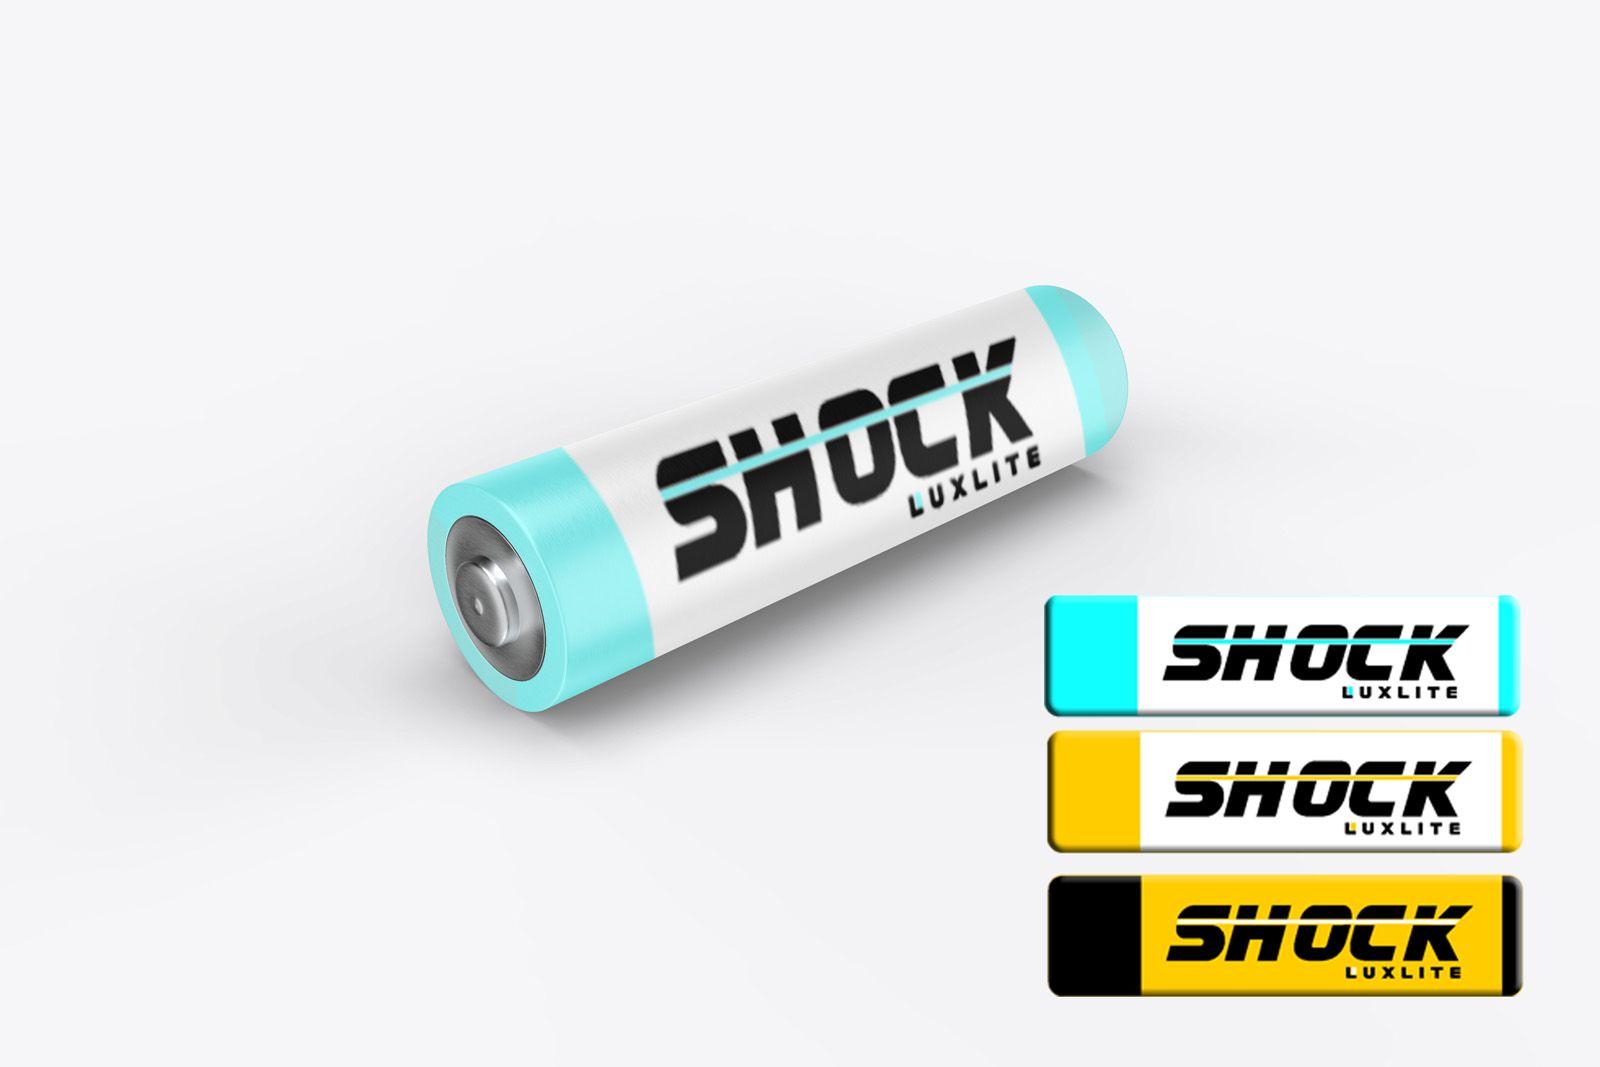 Логотип для батареек LUXLITE SHOCK - дизайнер yulyok13